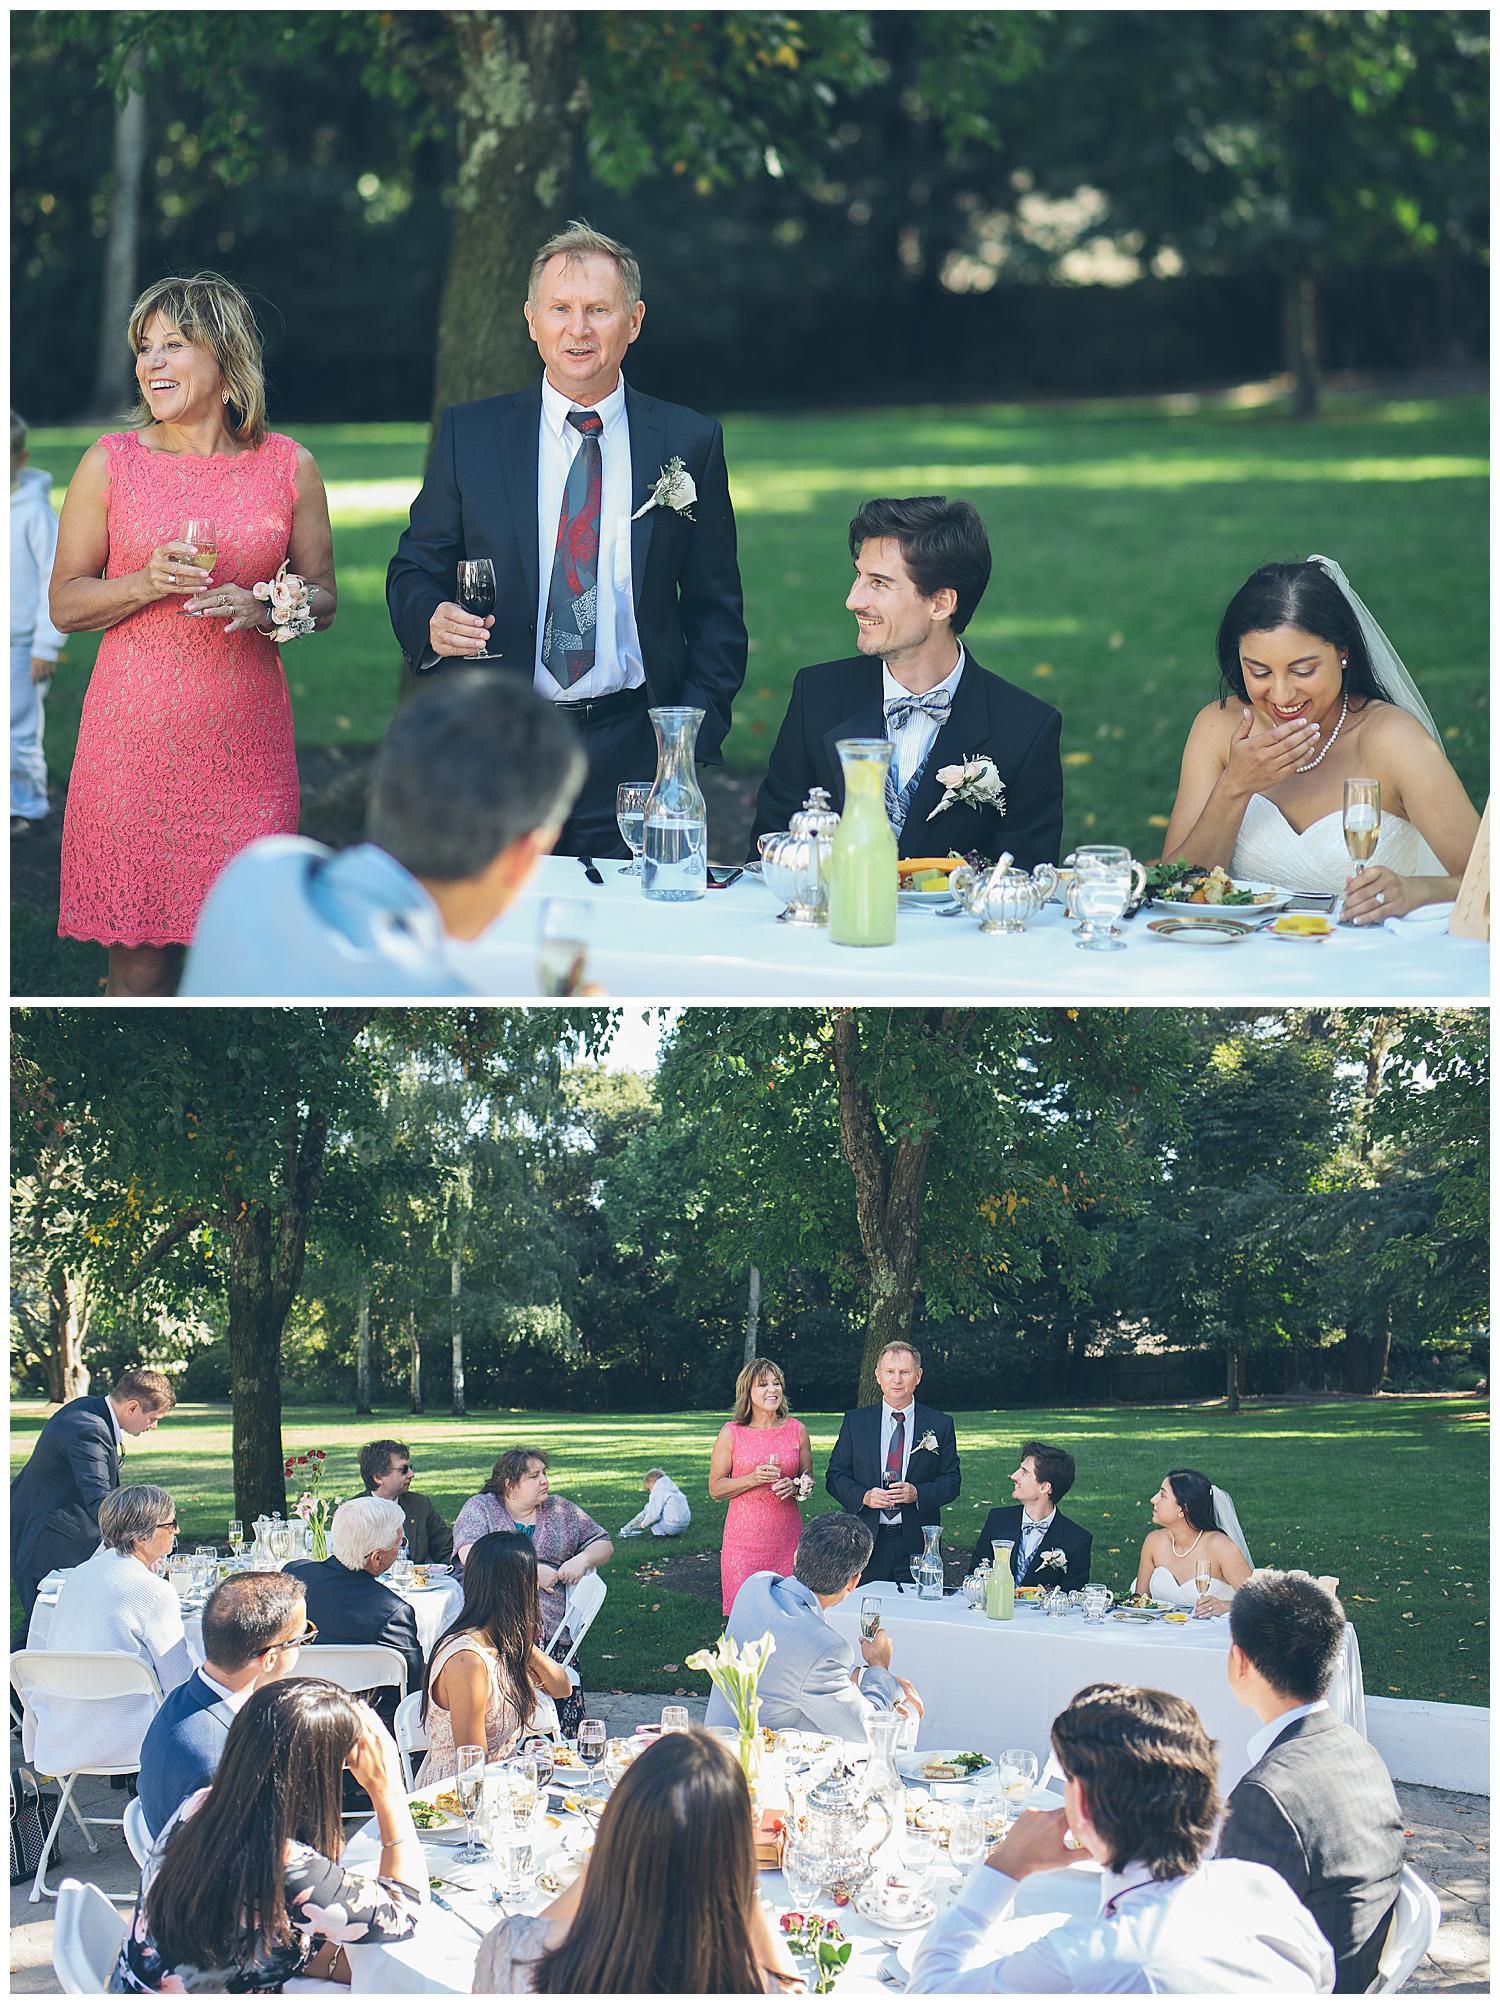 khariza-rae-photography-bay-area-wedding-photographer_0203.jpg